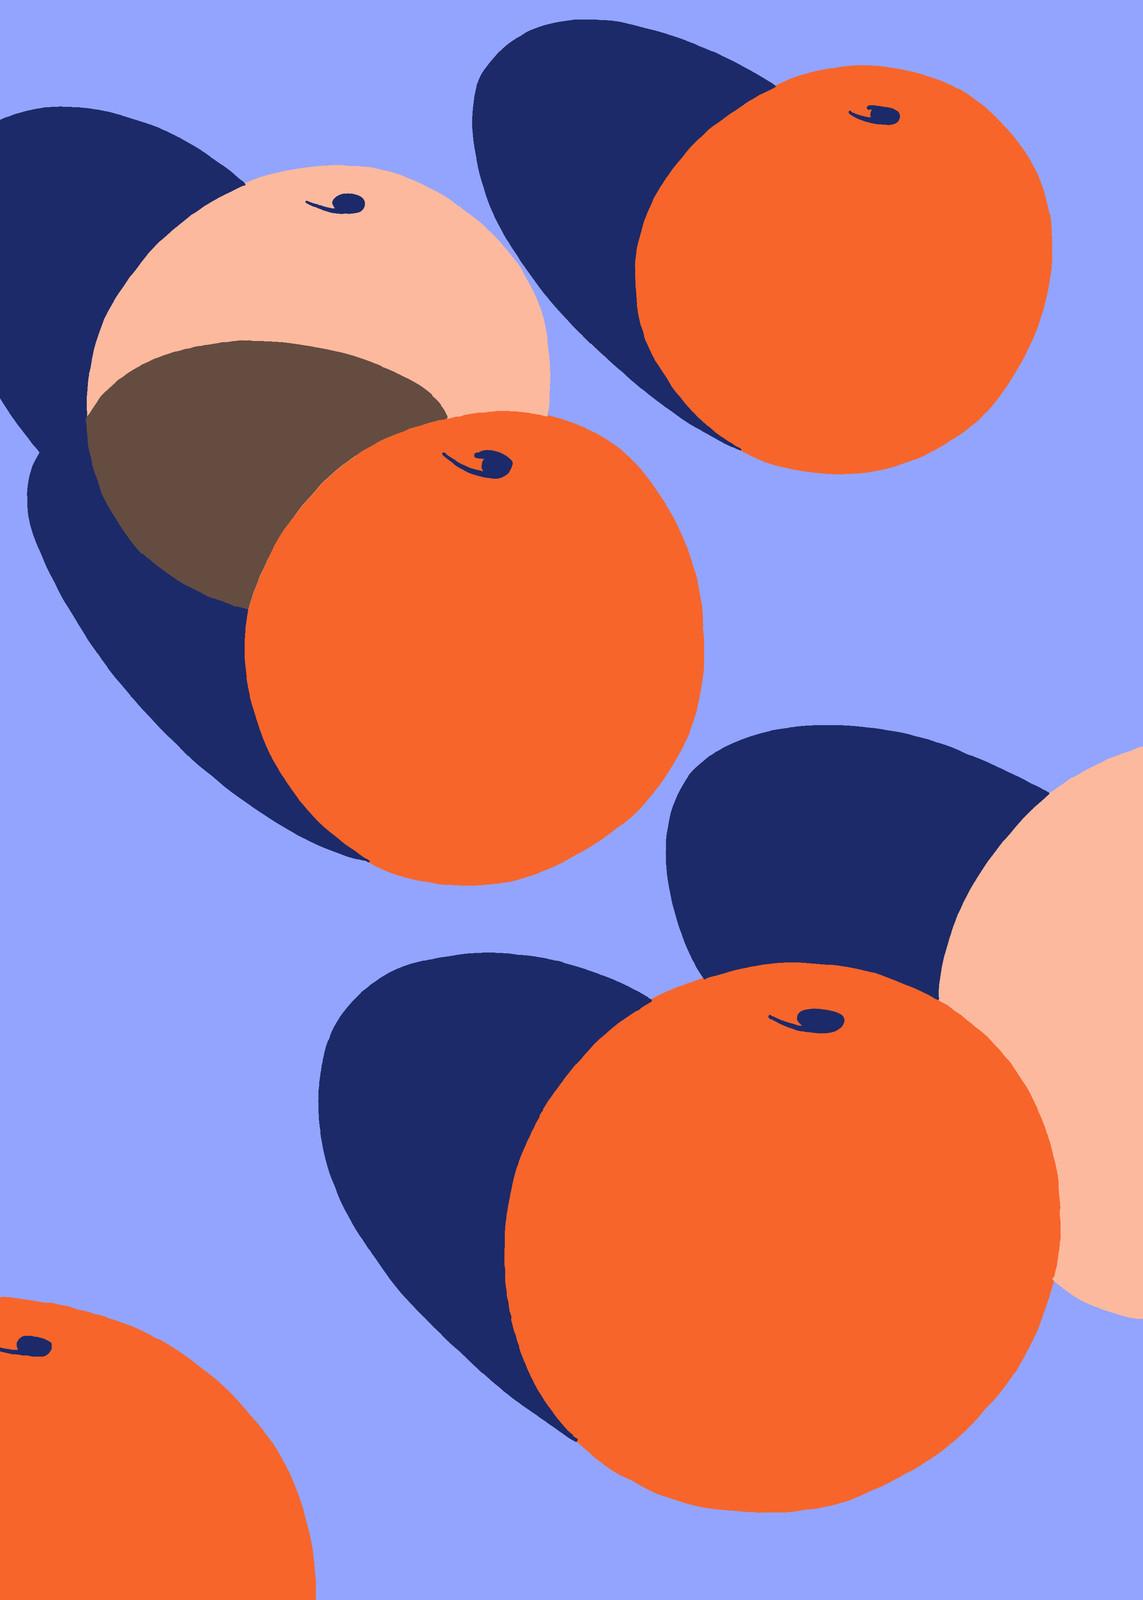 fallani venezia Ana Popescu Spazi Oranges  2020 silkscreen print on Fedrigoni 300gr paper 70x50 cm